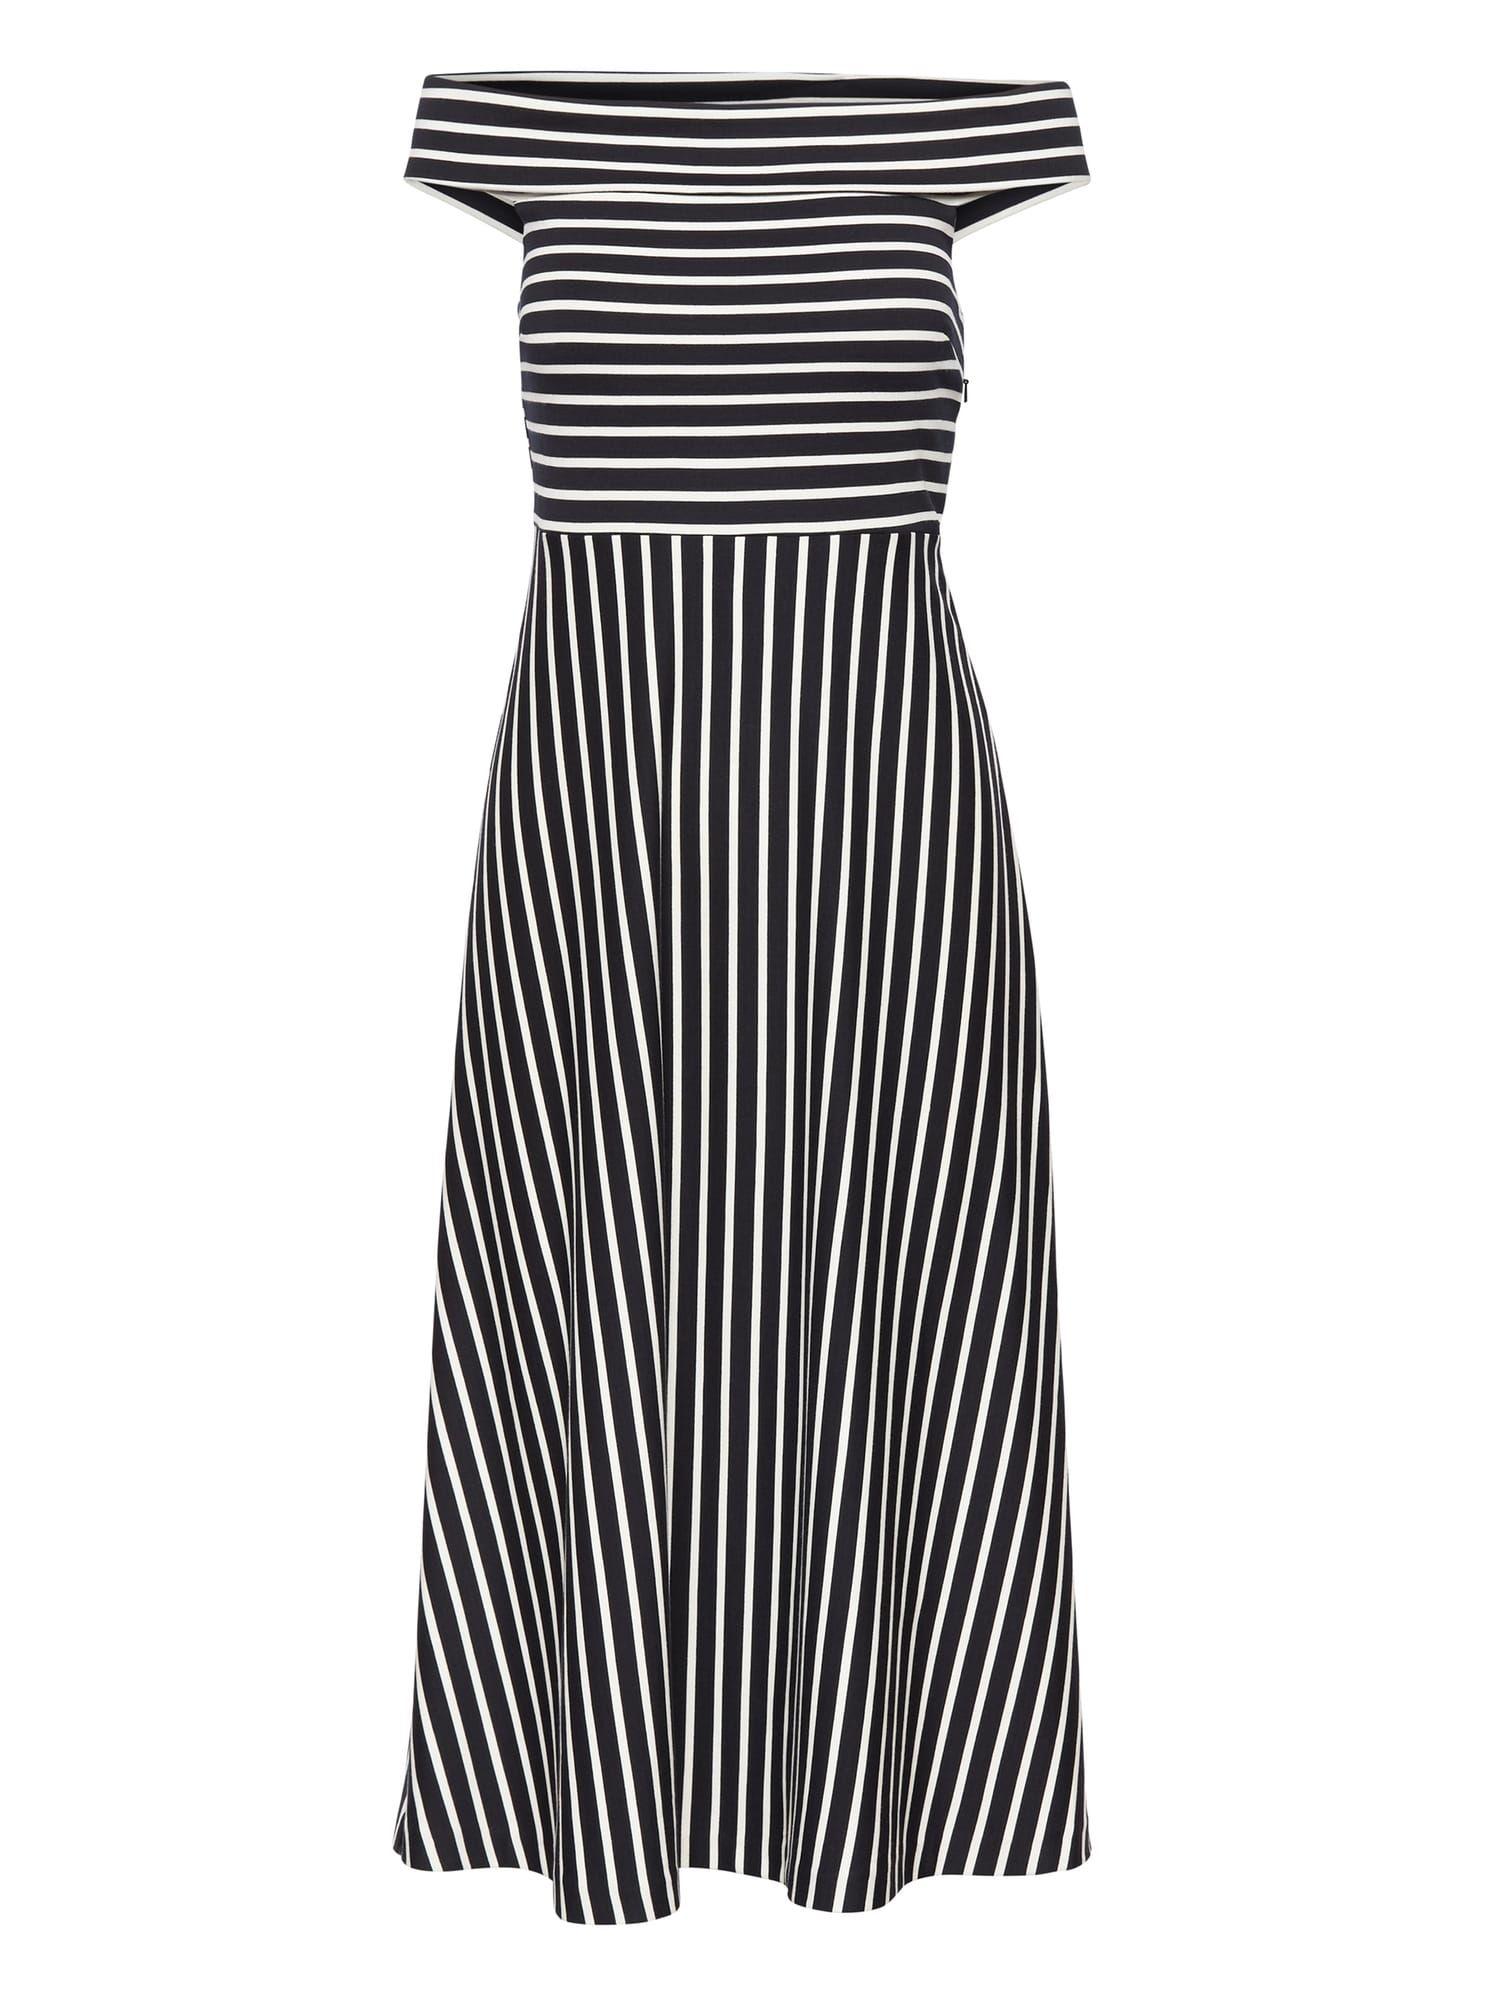 58c5b2d76994 Banana Republic Fall 2018 Stripe Ponte Off-the-Shoulder Dress ( 77 on sale)